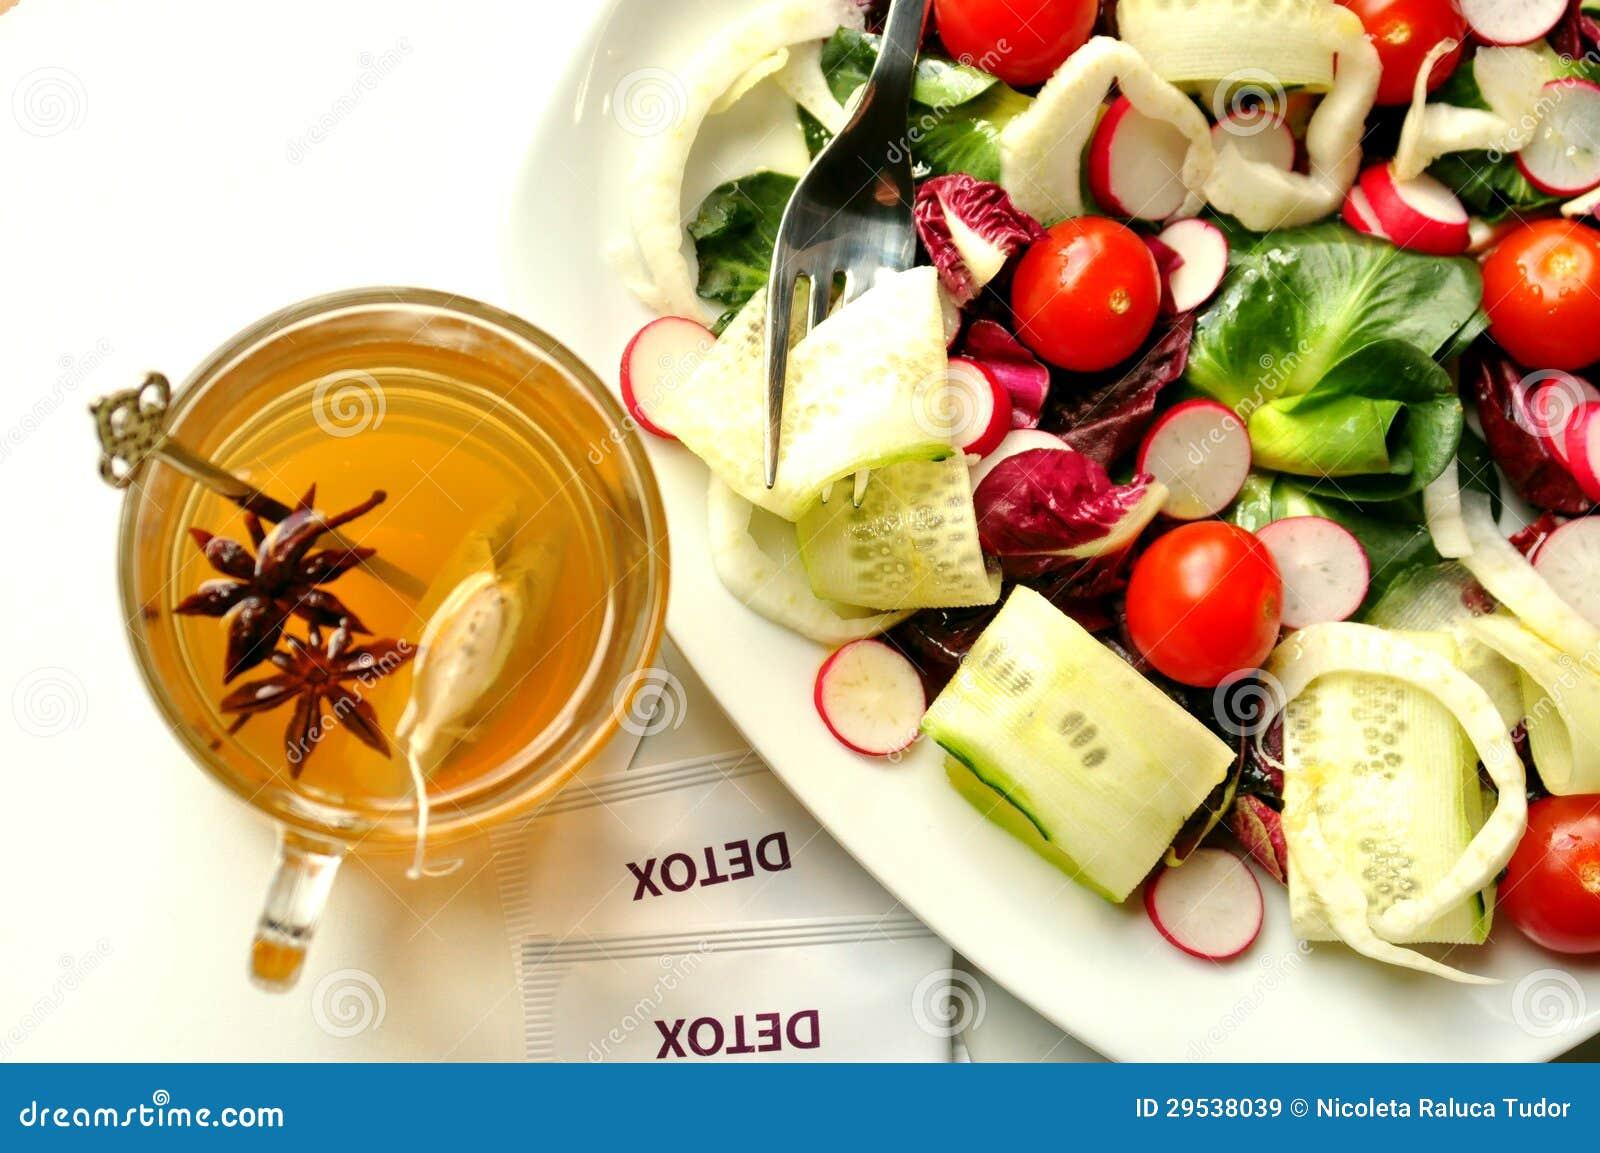 Detox diet with veggie salad and herbal tea